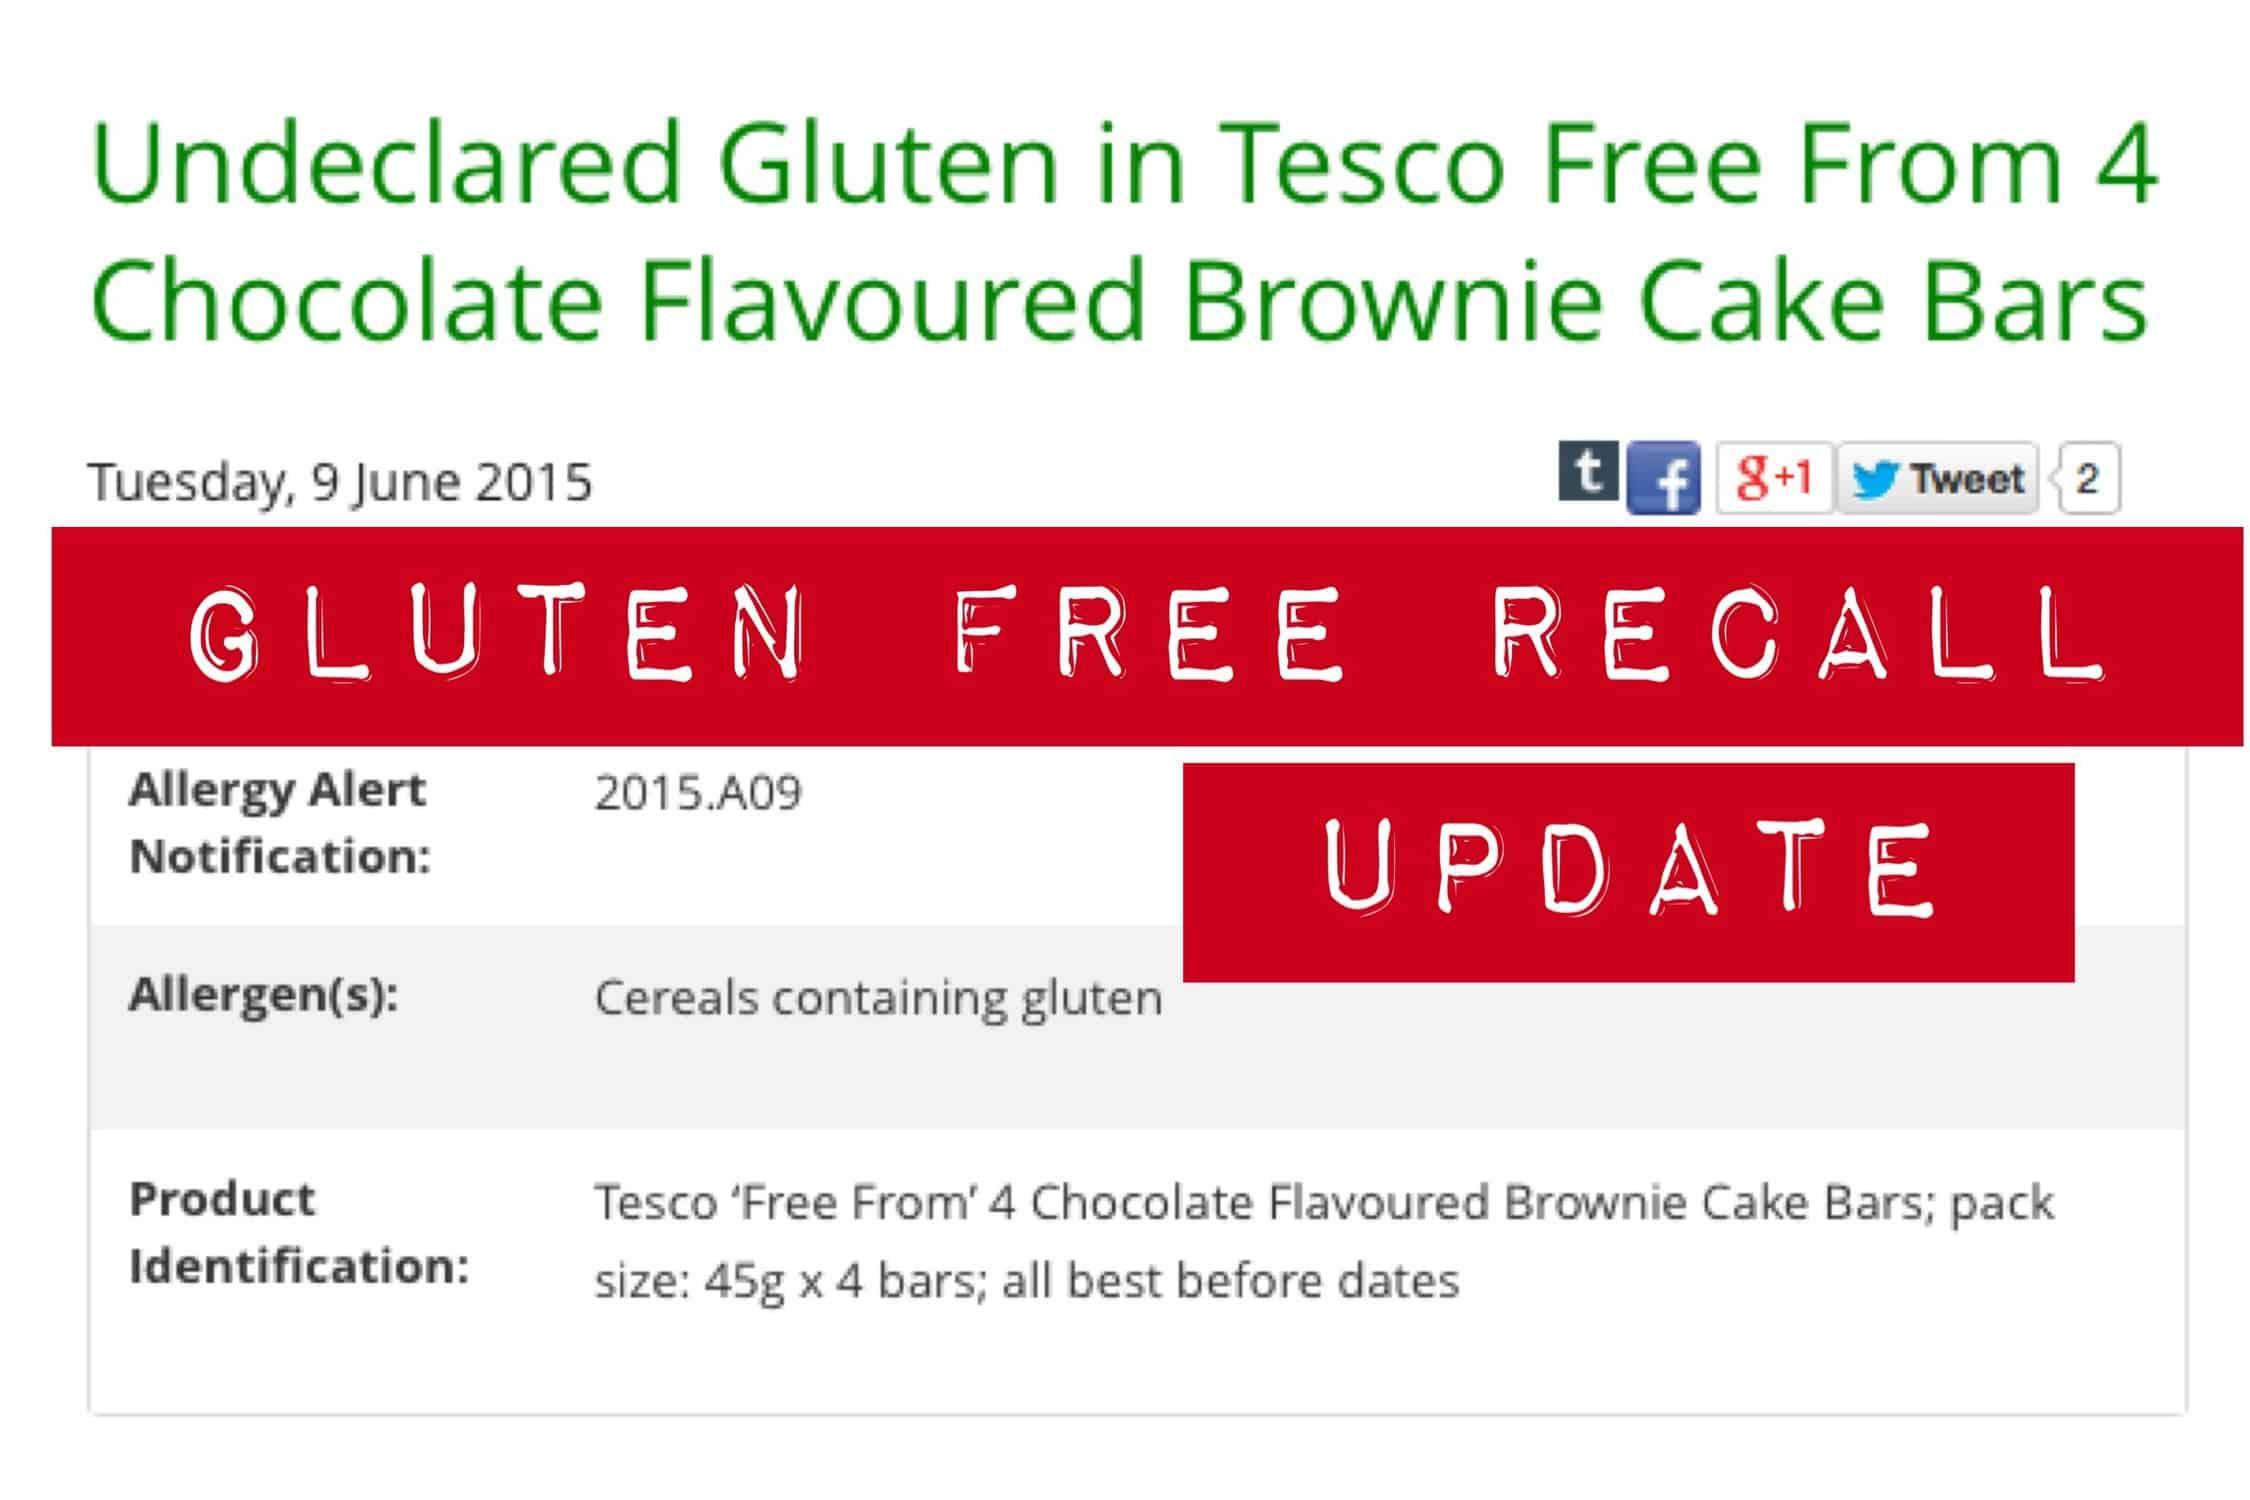 gluten free recall